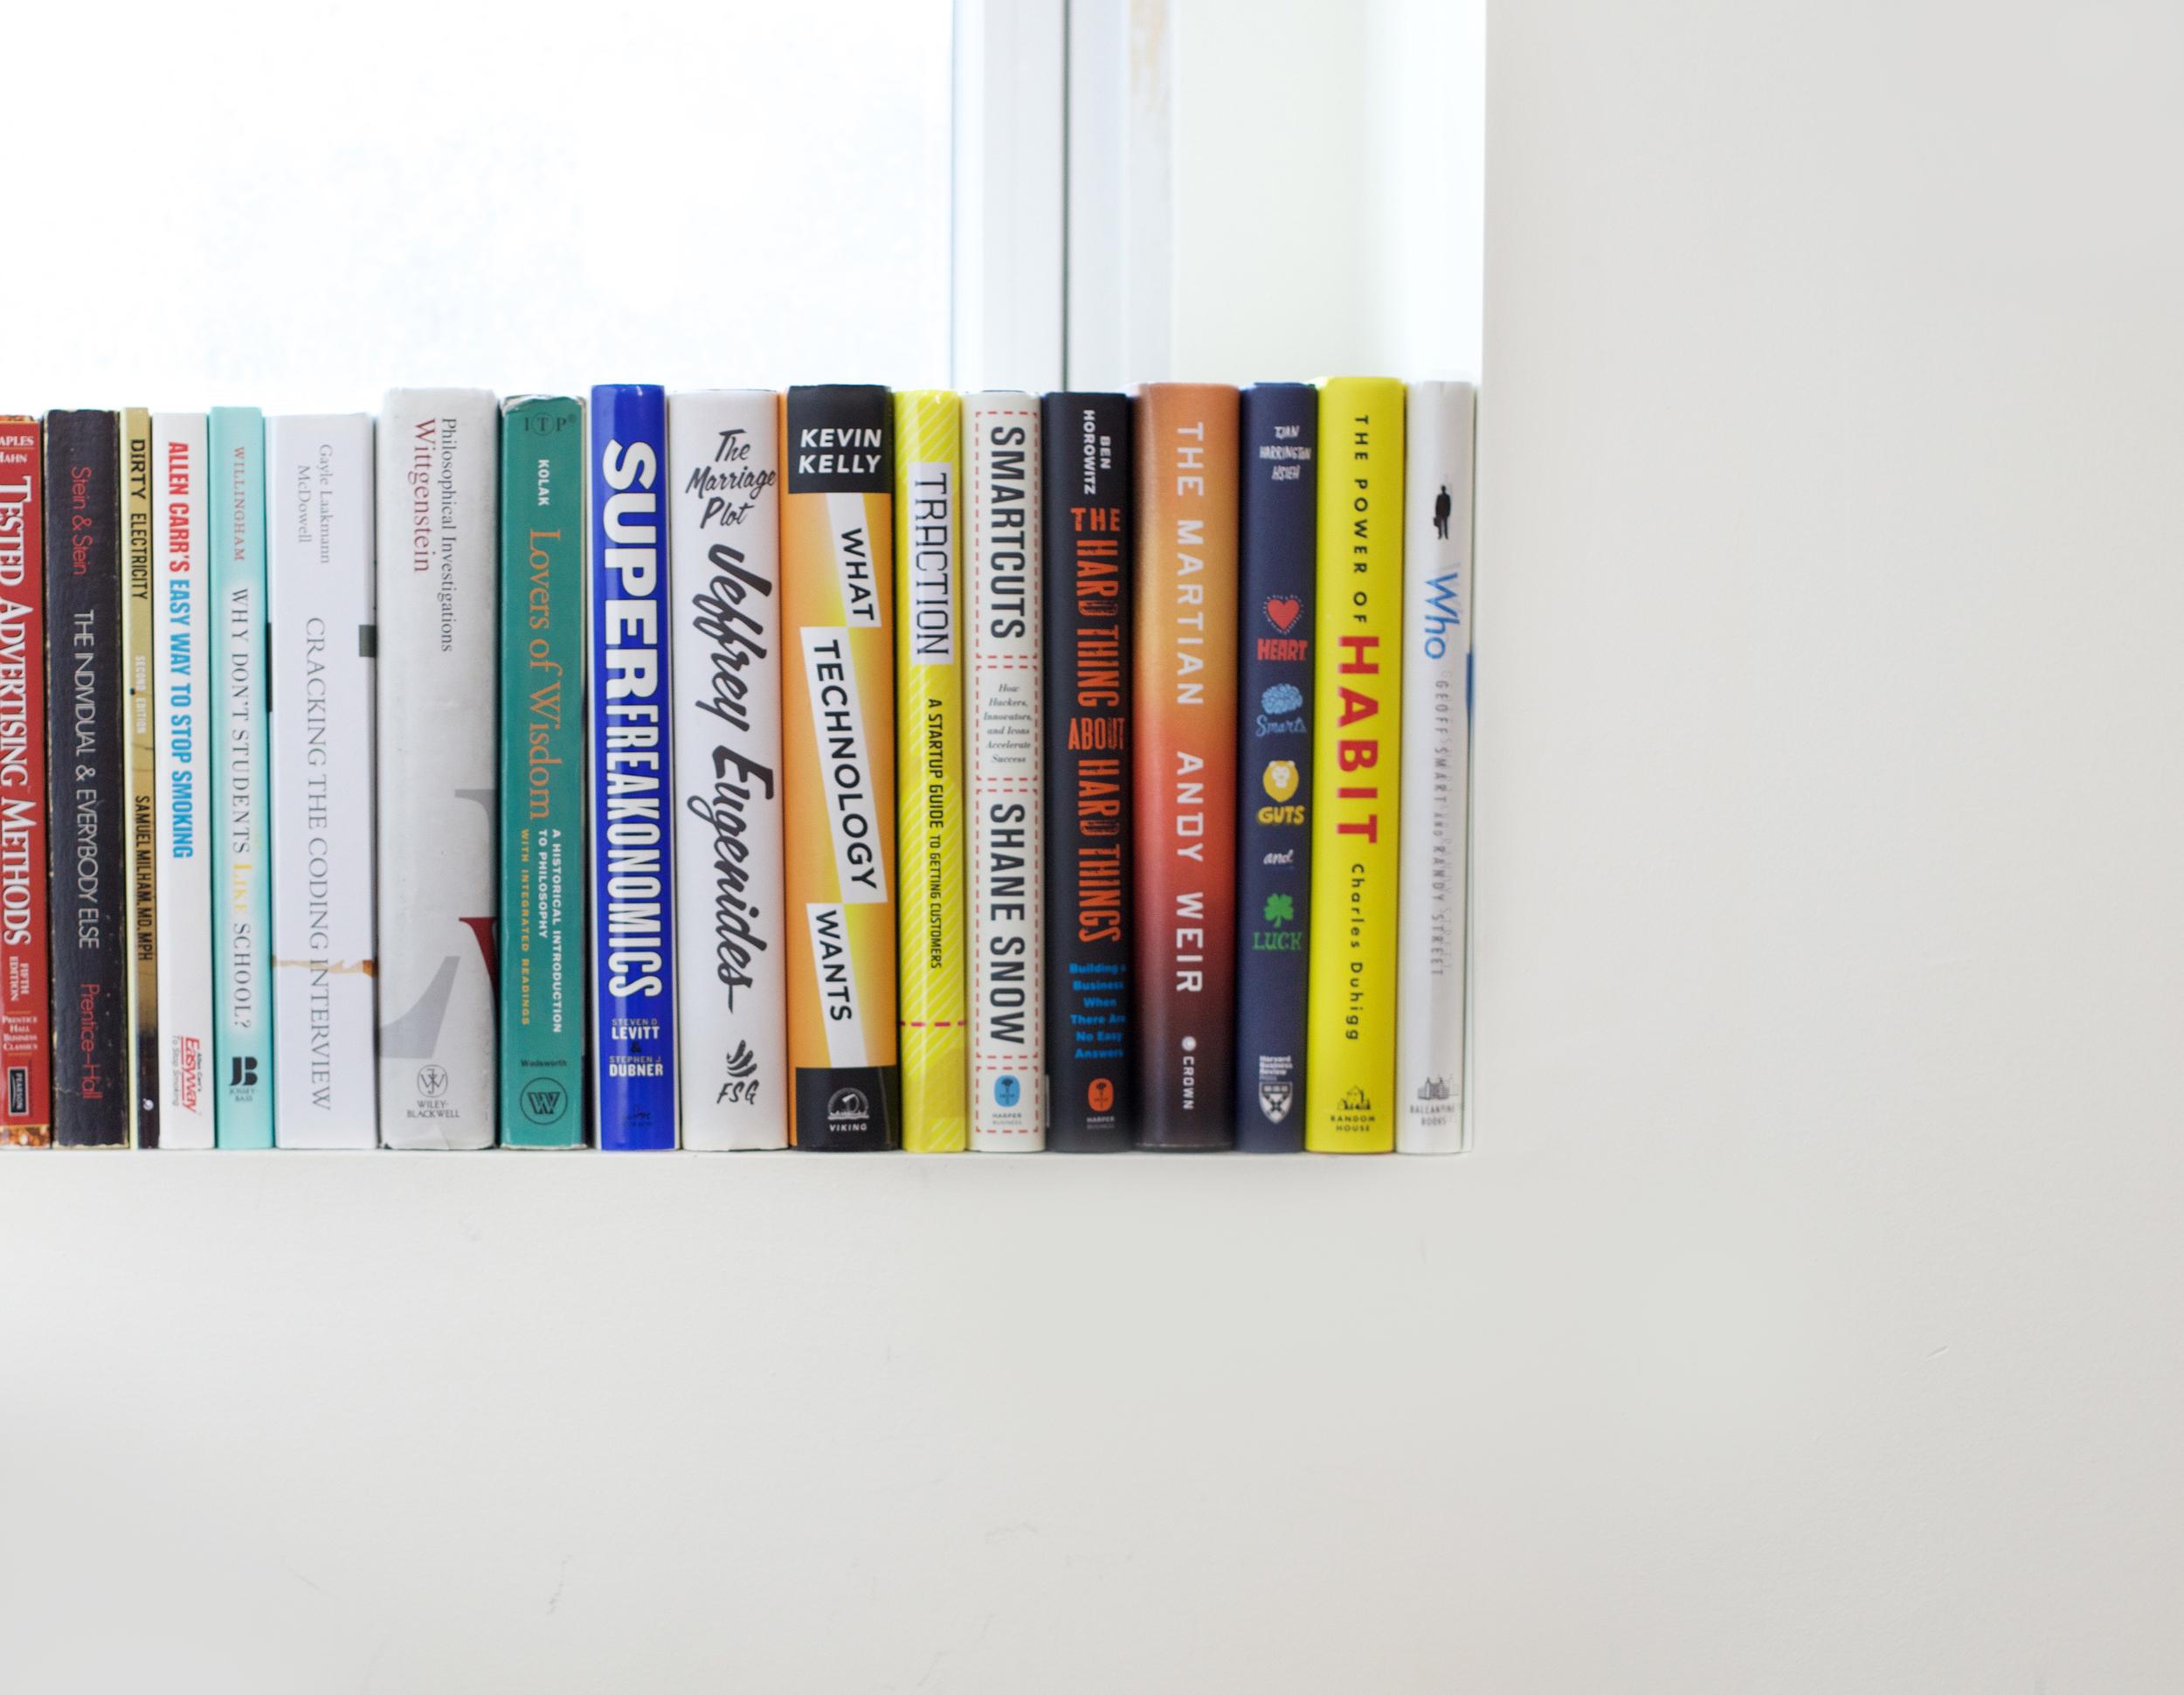 zmaic-one-month-interior-design-conference-room-window-books.jpg